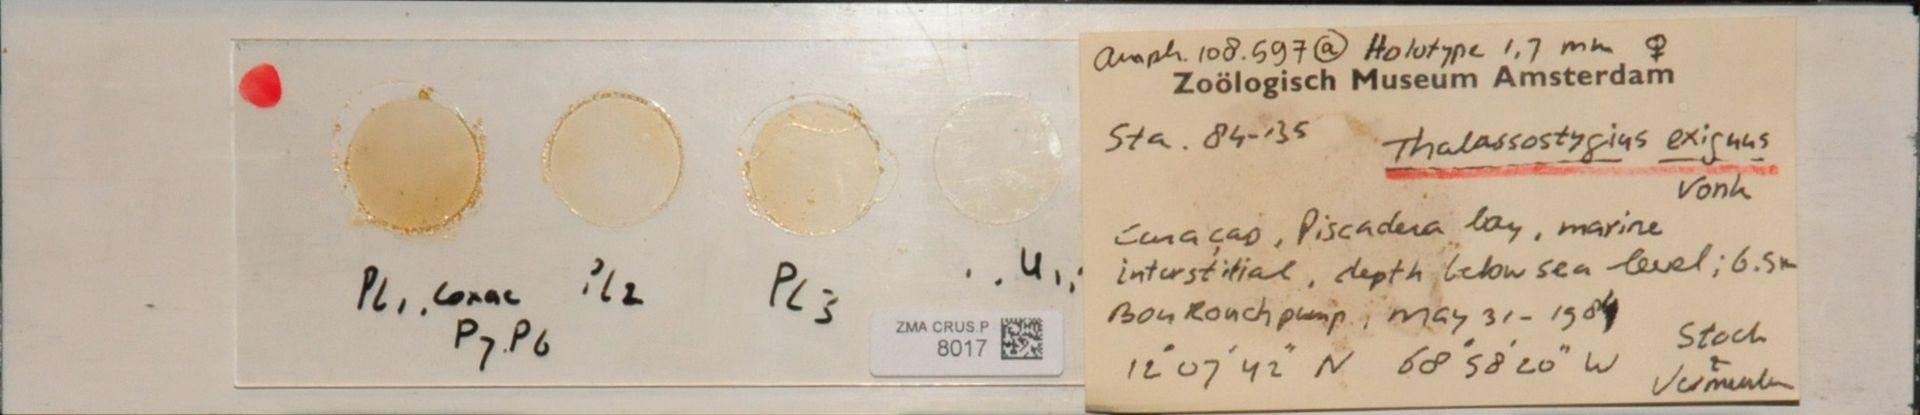 ZMA.CRUS.P.8017 | Thalassostygius exiguus Vonk